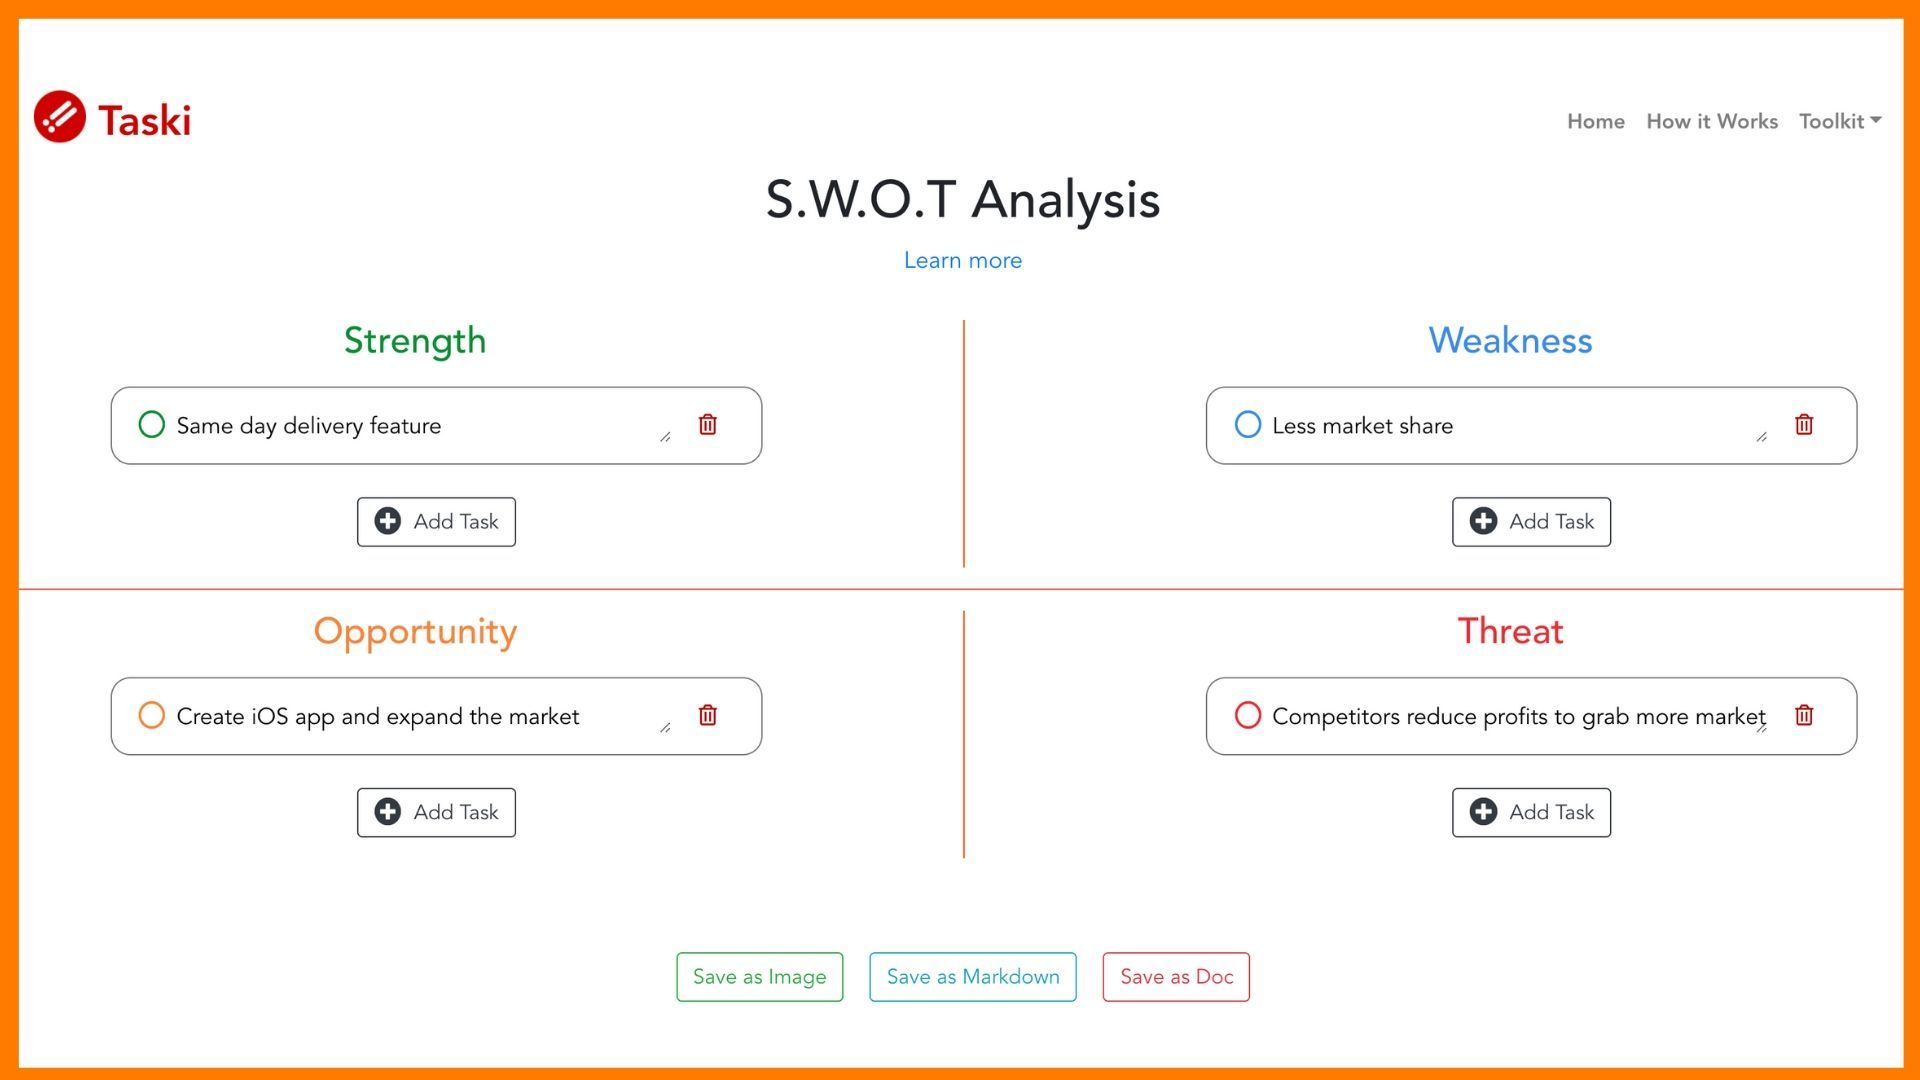 Taski SWOT Analysis